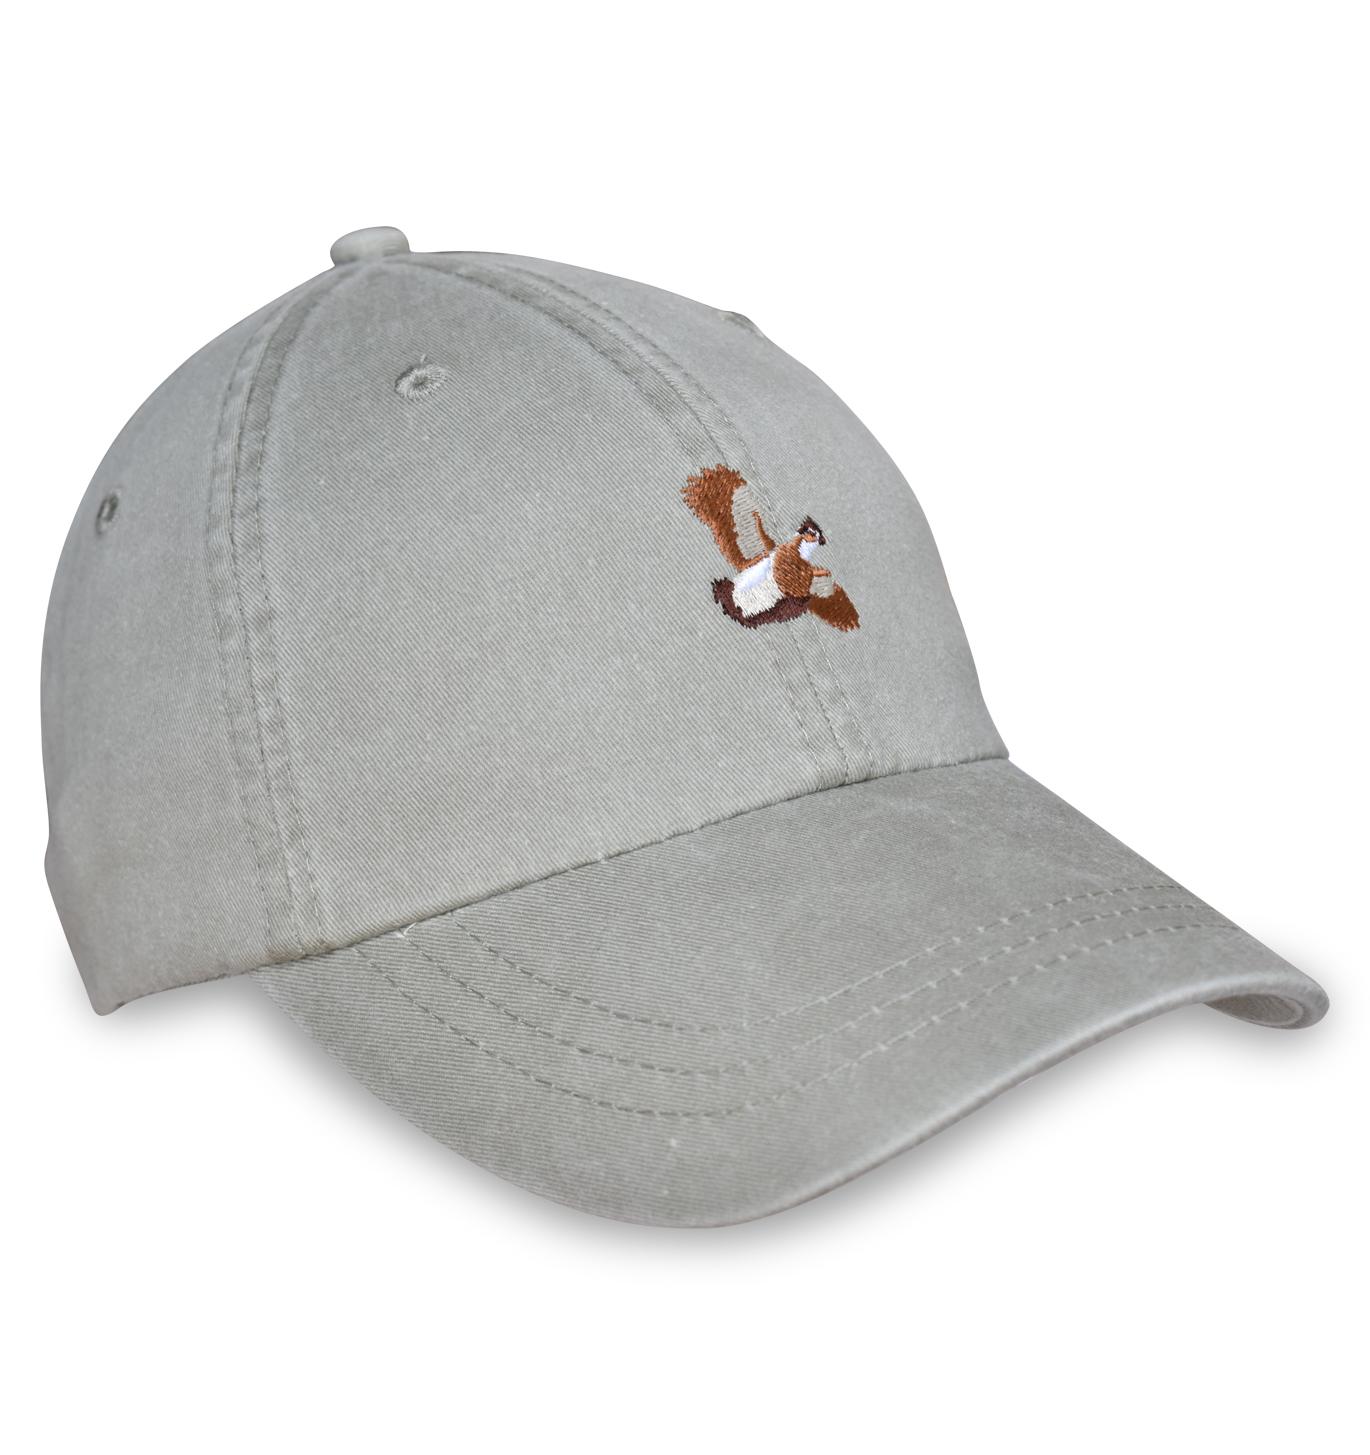 Quail Sporting Cap - Stone